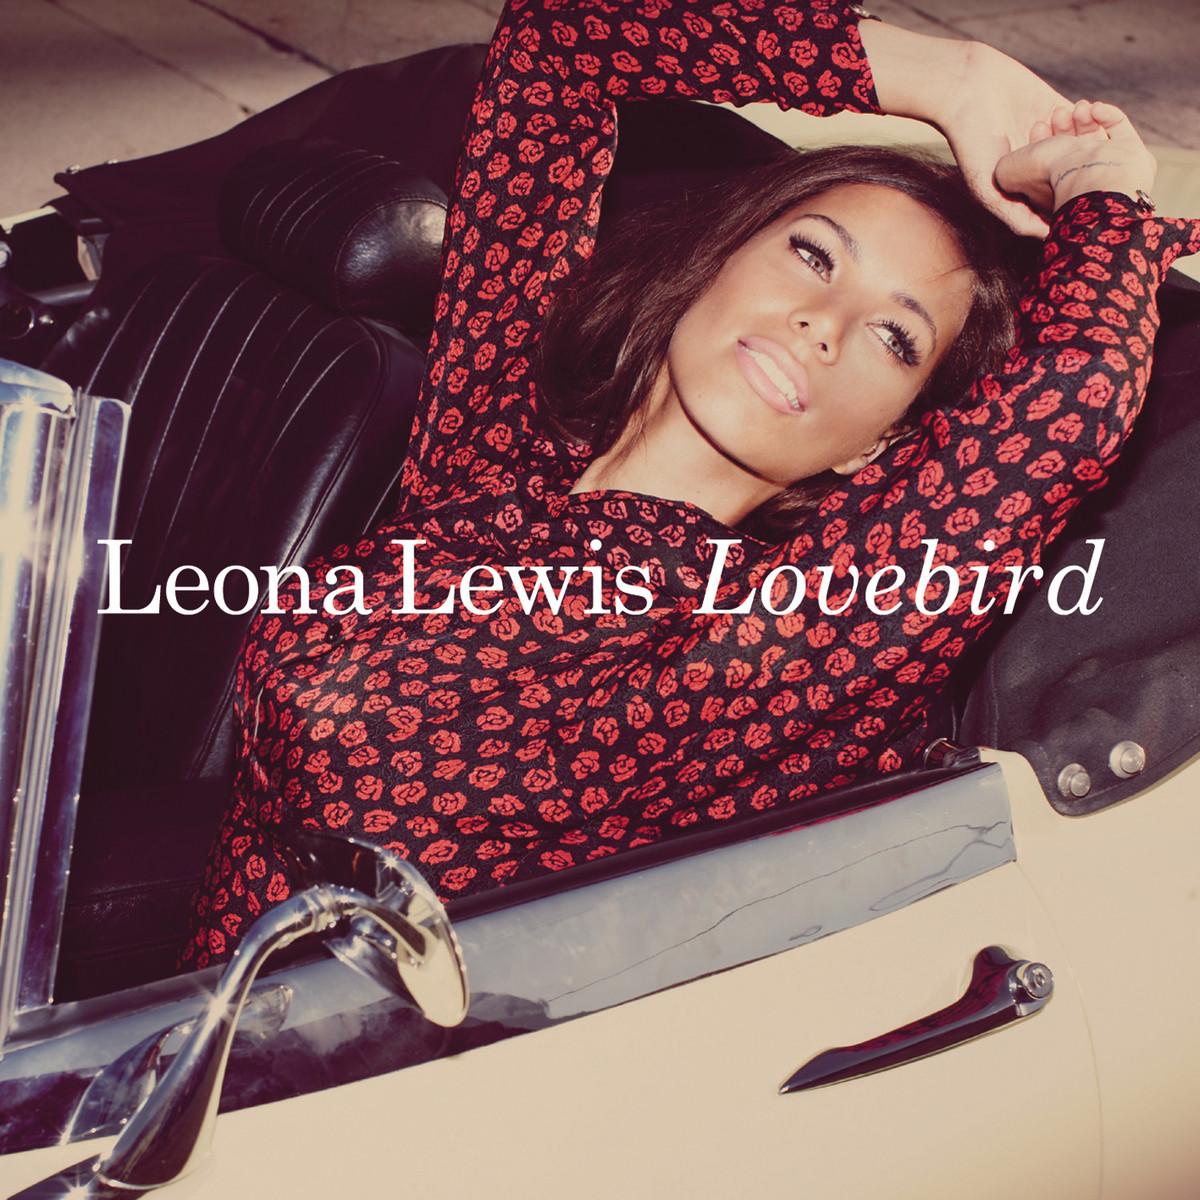 http://4.bp.blogspot.com/-N6K1h0YtH0s/USztDuatO8I/AAAAAAAAAQo/iuc7MHkS8Kg/s1600/Leona+Lewis+-+Lovebird.png